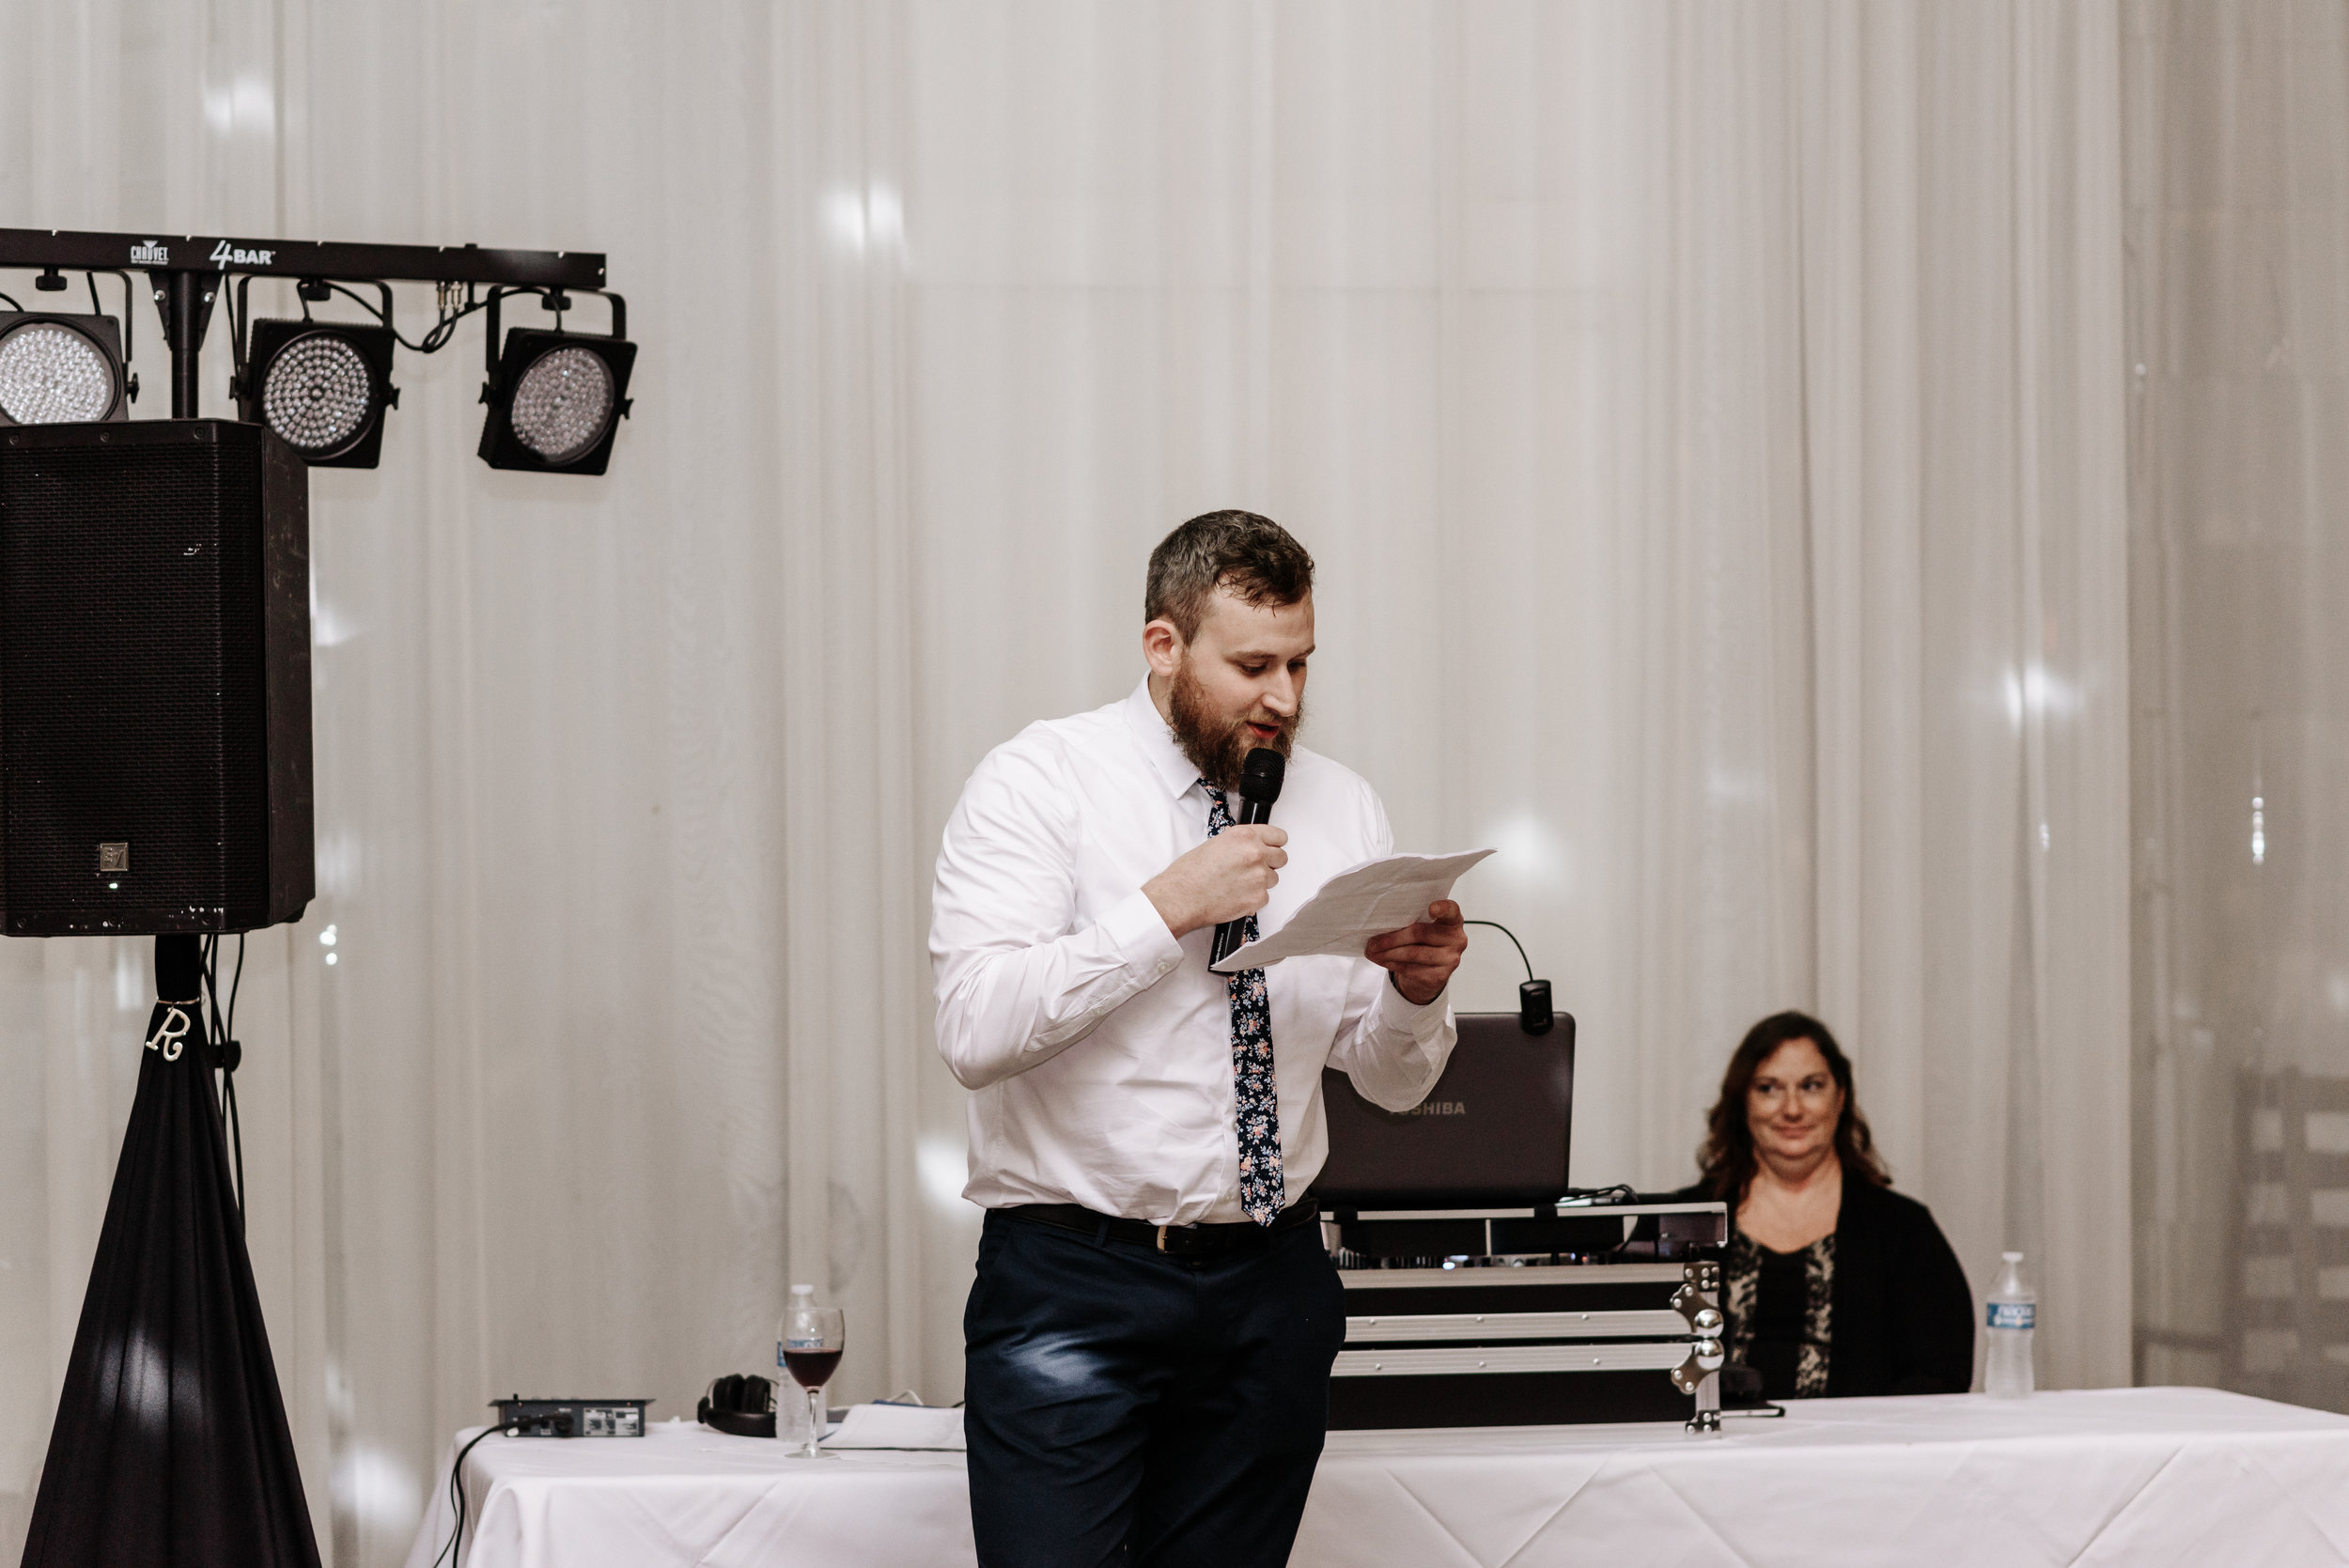 Veritas-Vineyards-and-Winery-Wedding-Photography-Afton-Virginia-Yasmin-Seth-Photography-by-V-3126.jpg